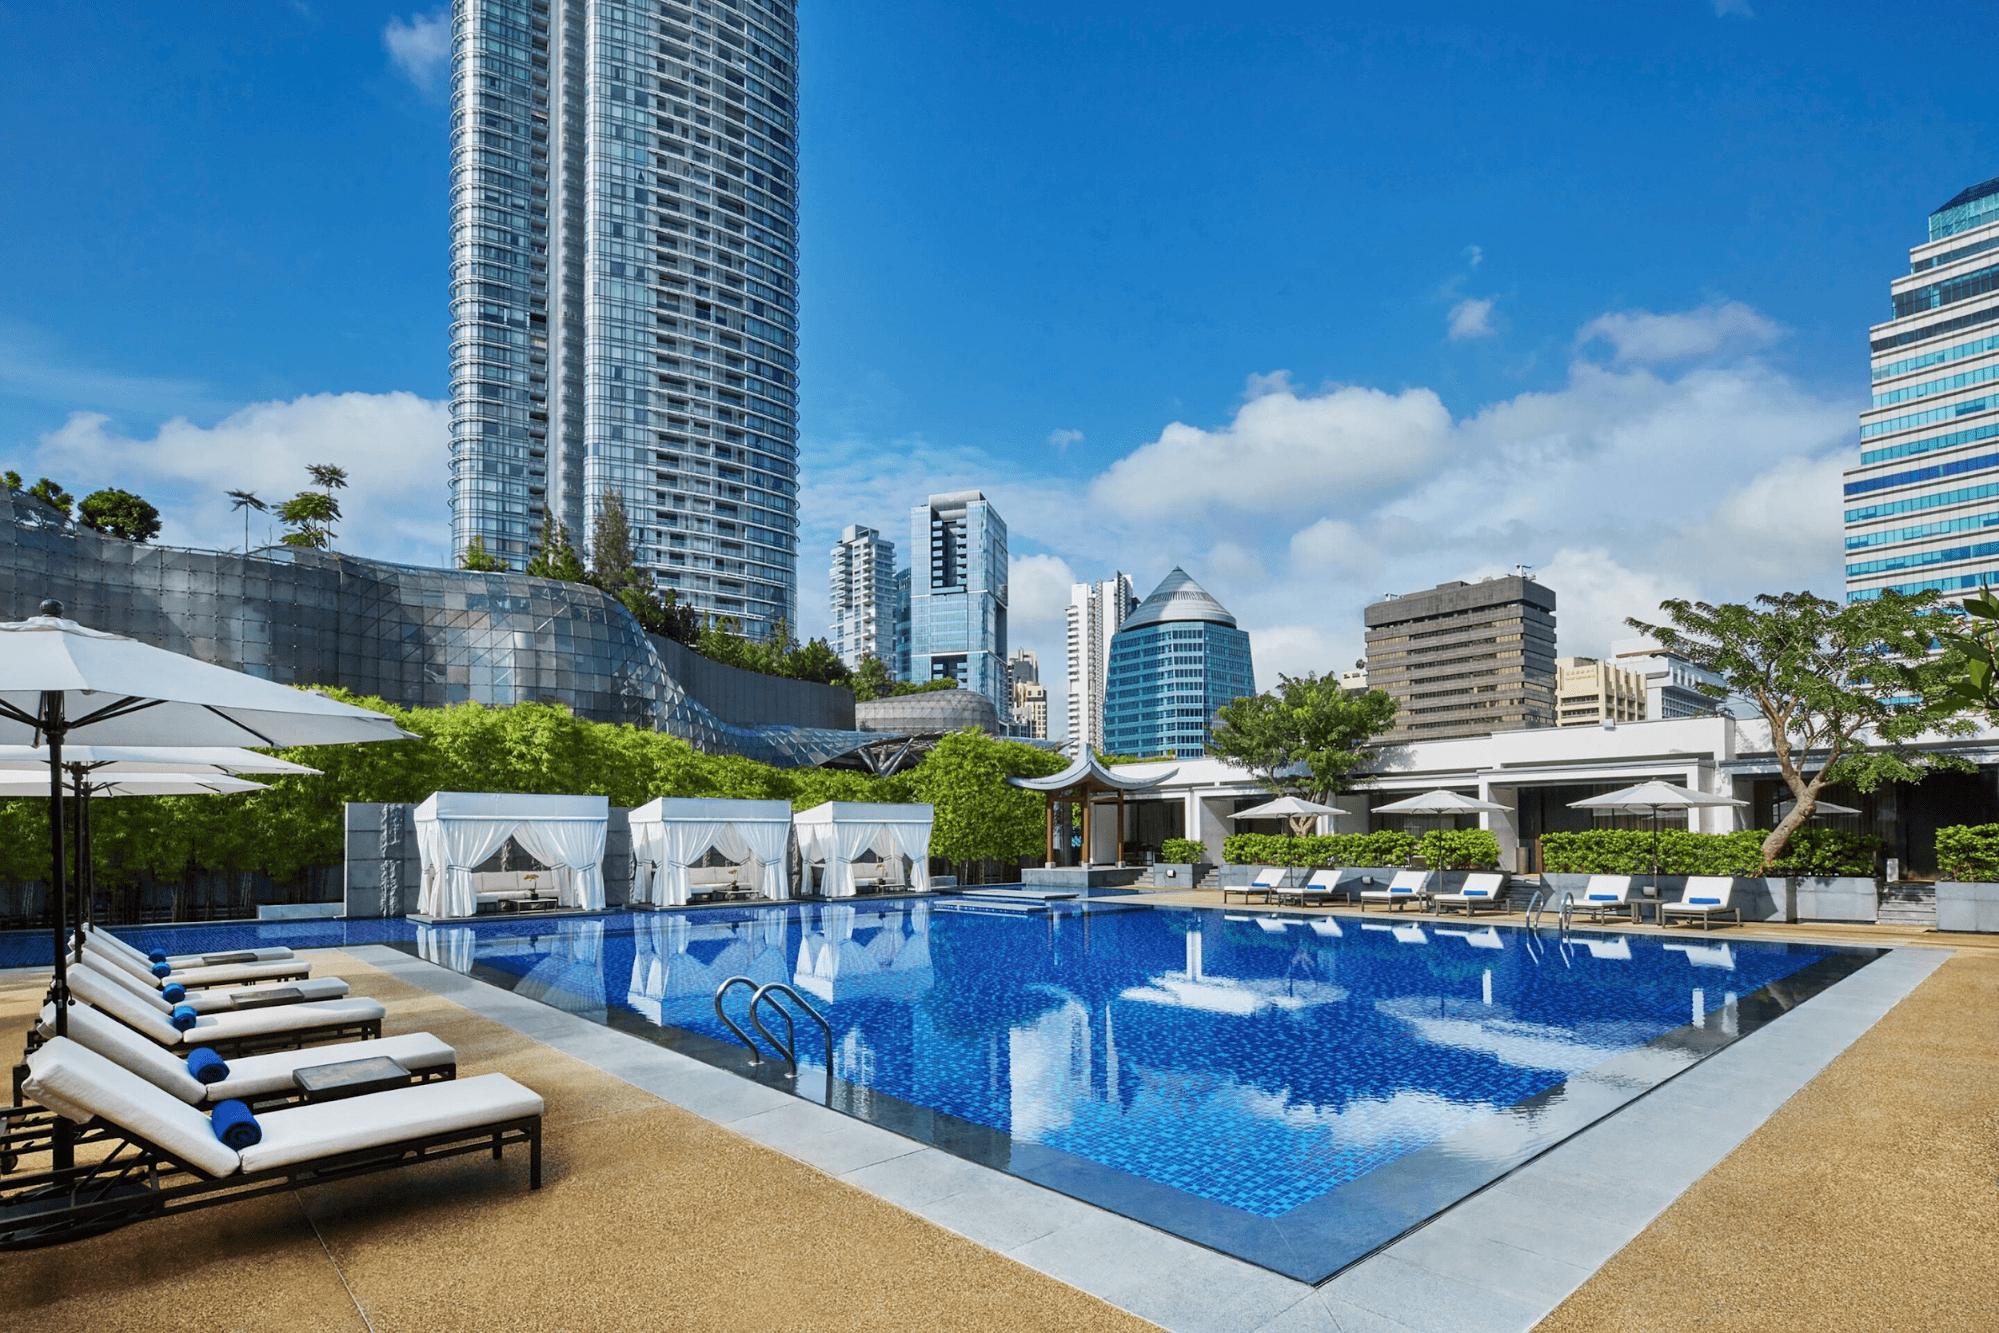 Marriott Tang Plaza swimming pool